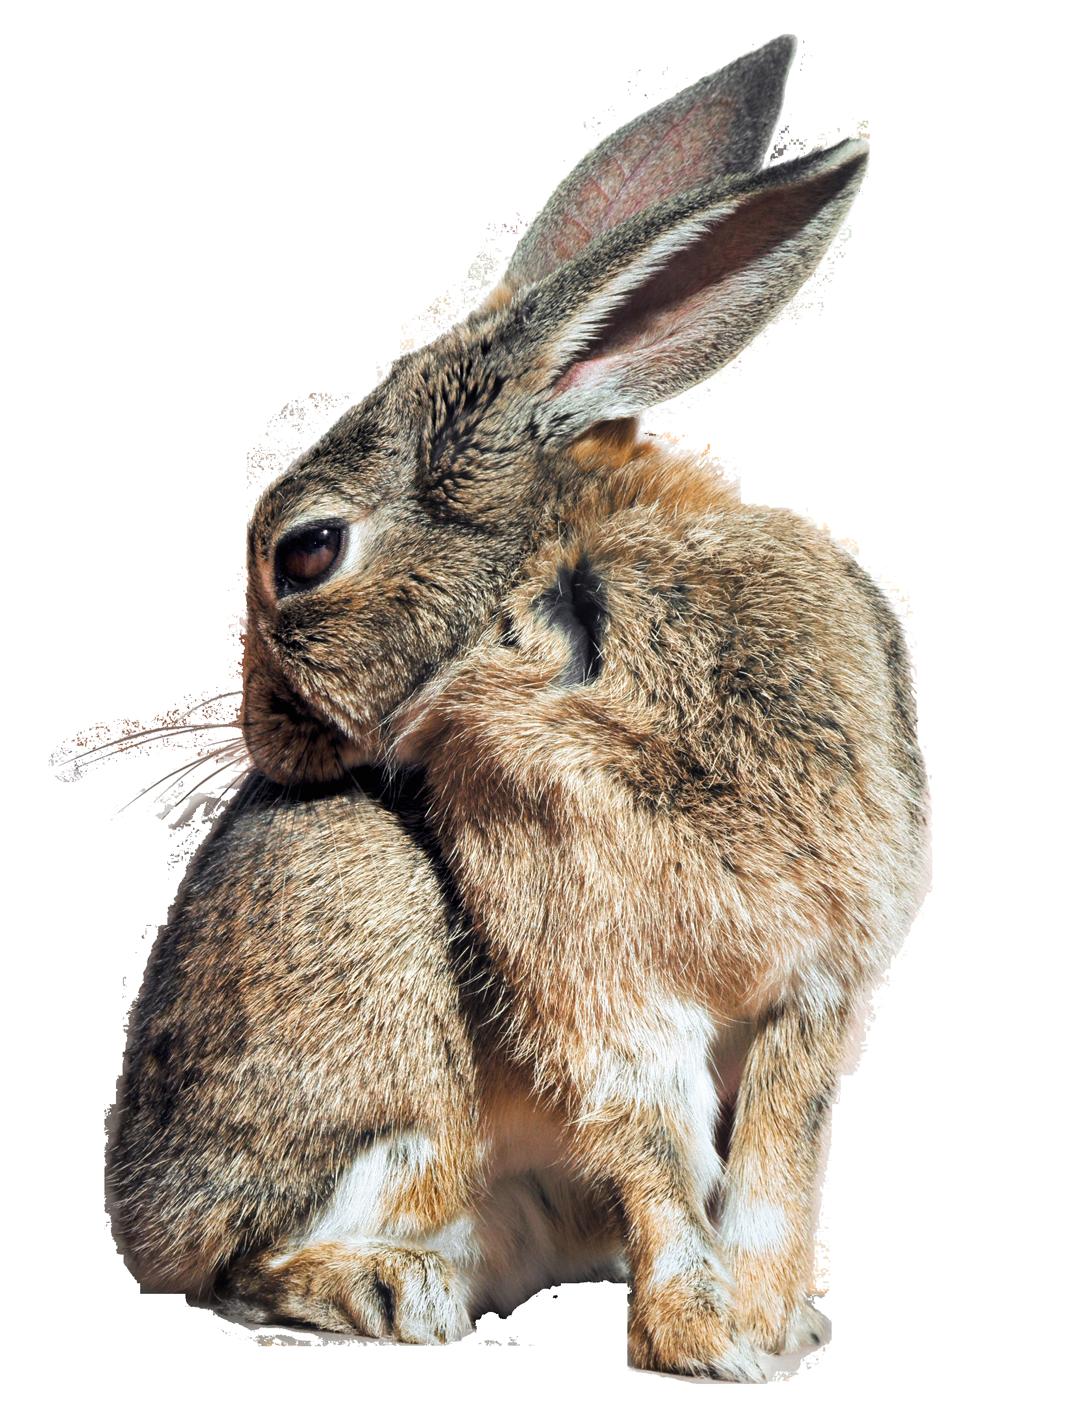 Bunny Rabbit PNG Transparent Image - Rabbit PNG